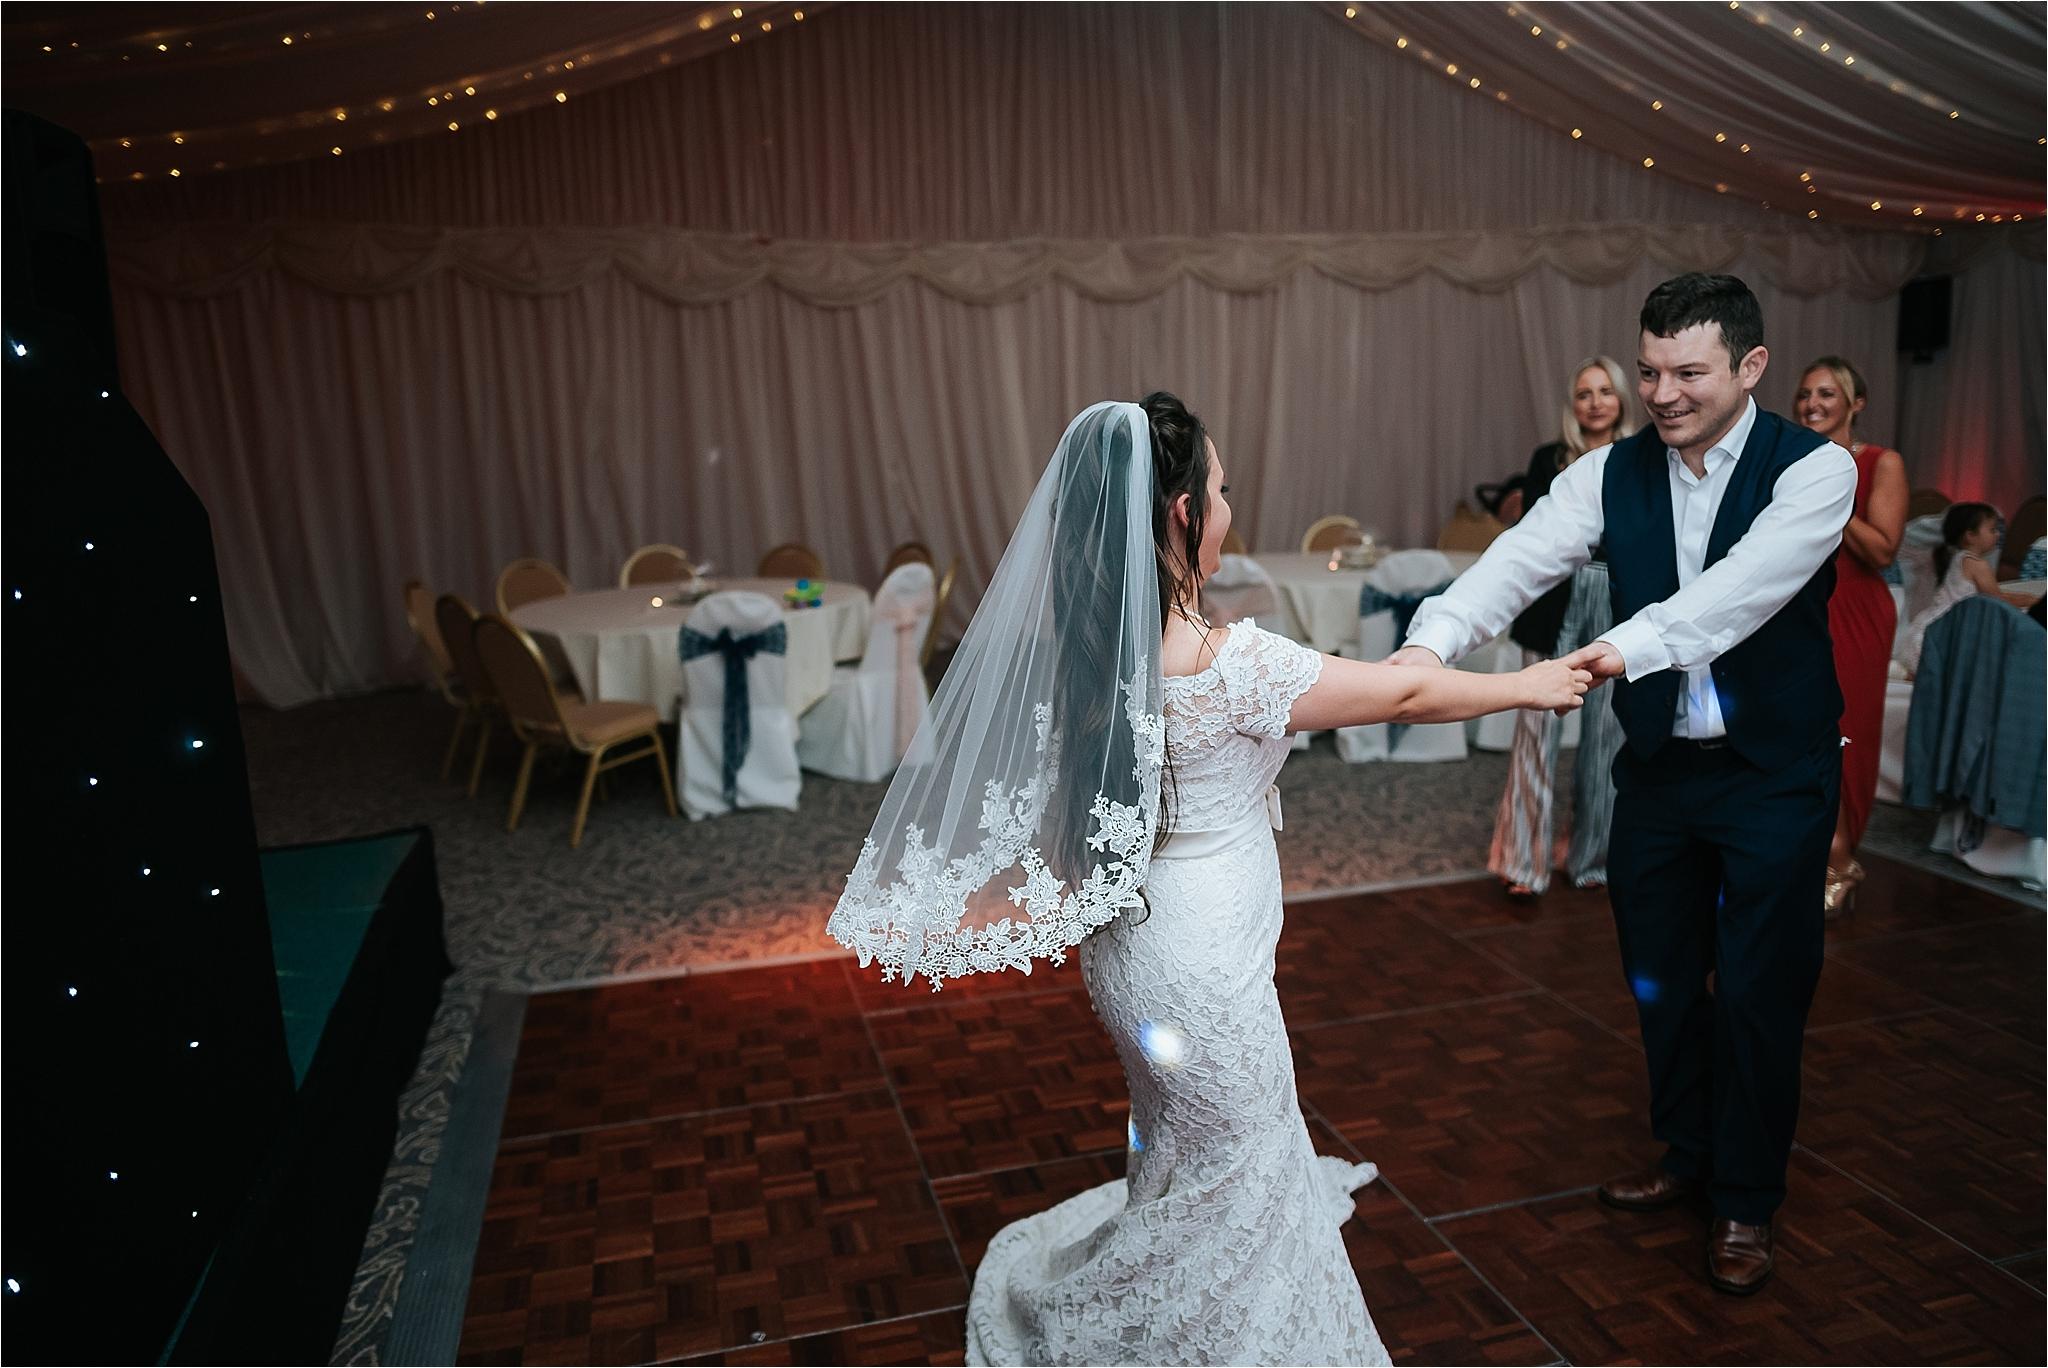 thevilla+lancashire+wreagreen+wedding+photographer121.jpg